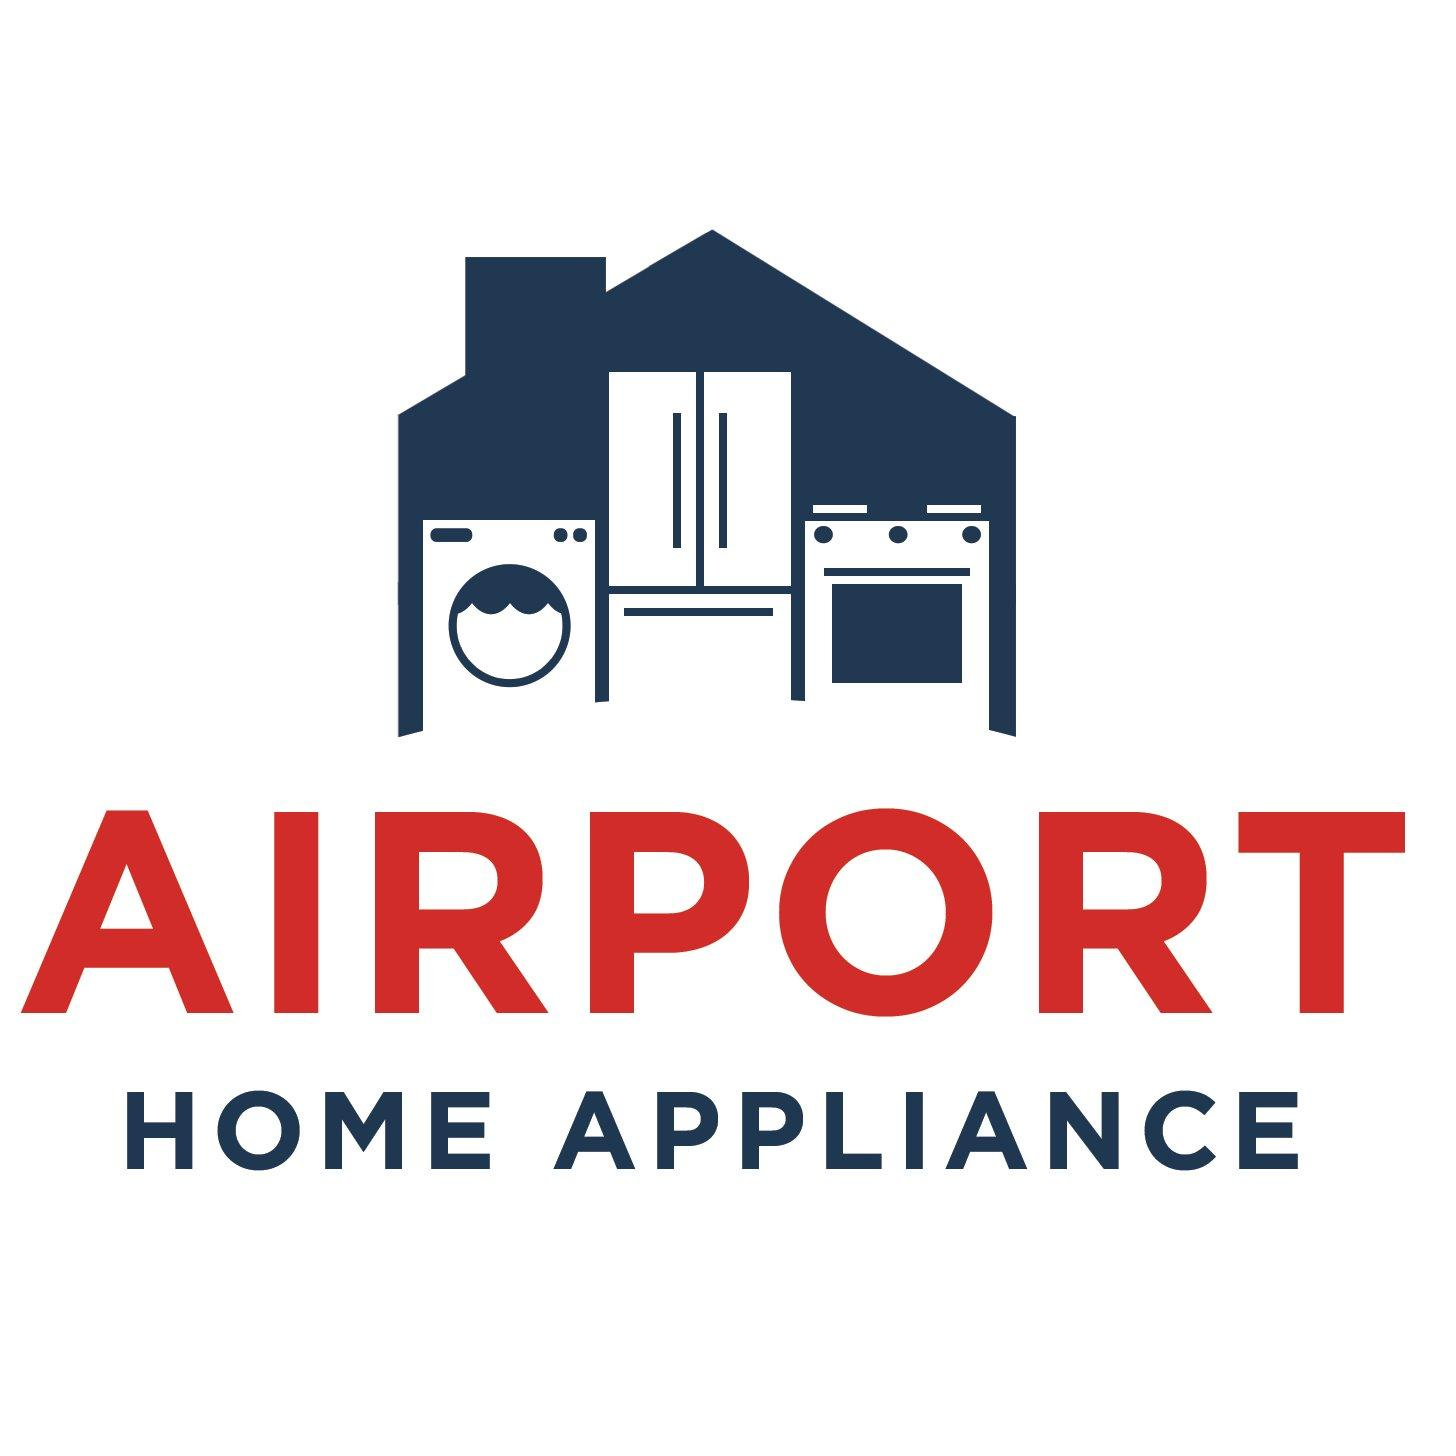 Fullsize Of Airport Home Appliance